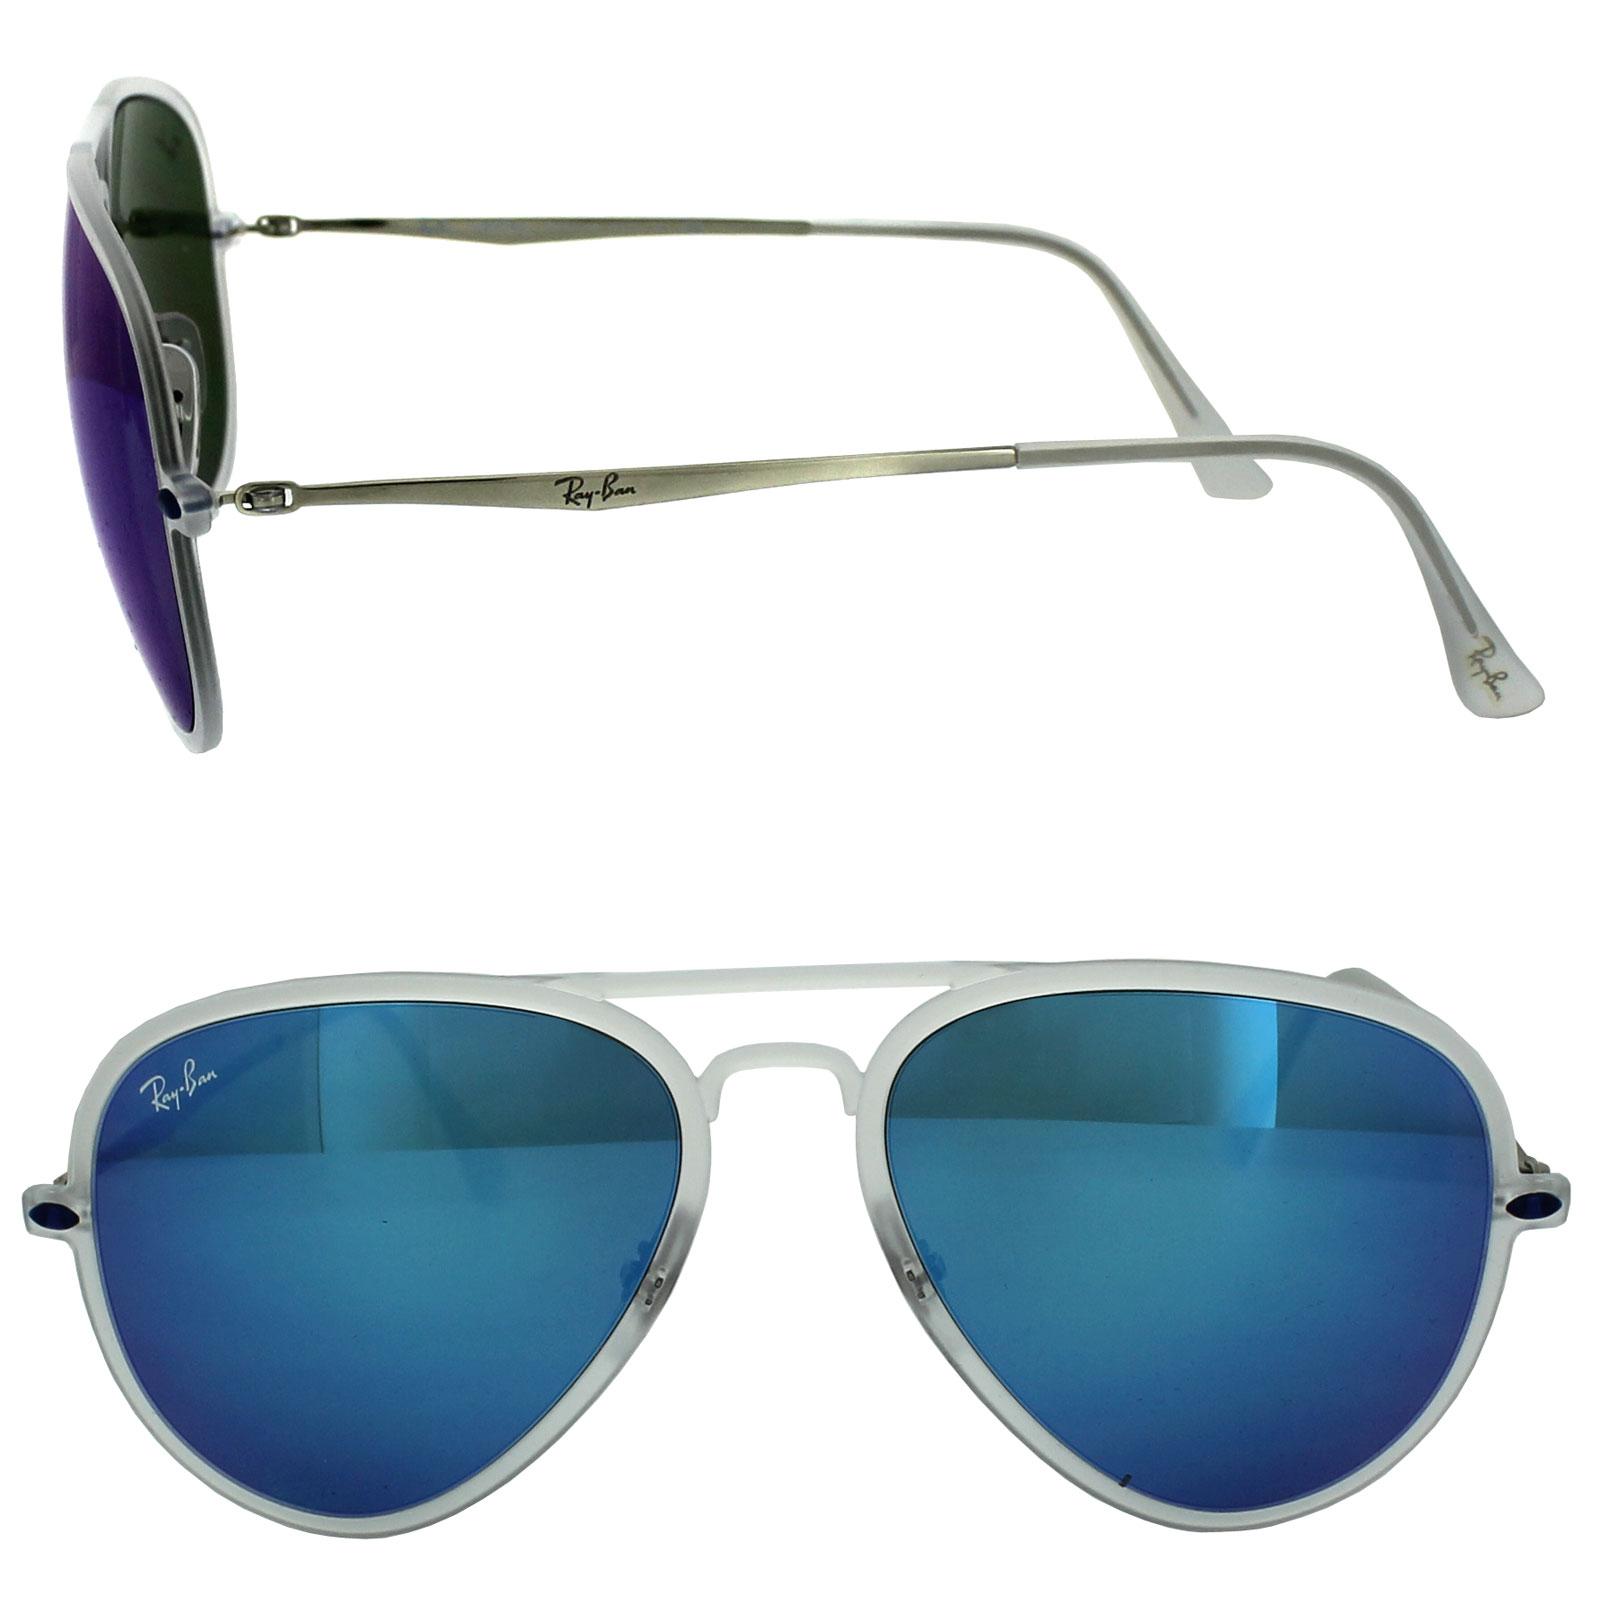 Sentinel Thumbnail 2. Sentinel Ray-Ban Sunglasses Aviator Light Ray II 4211  646 55 Matt Transparent Blue Mirror 26e4ffaff5